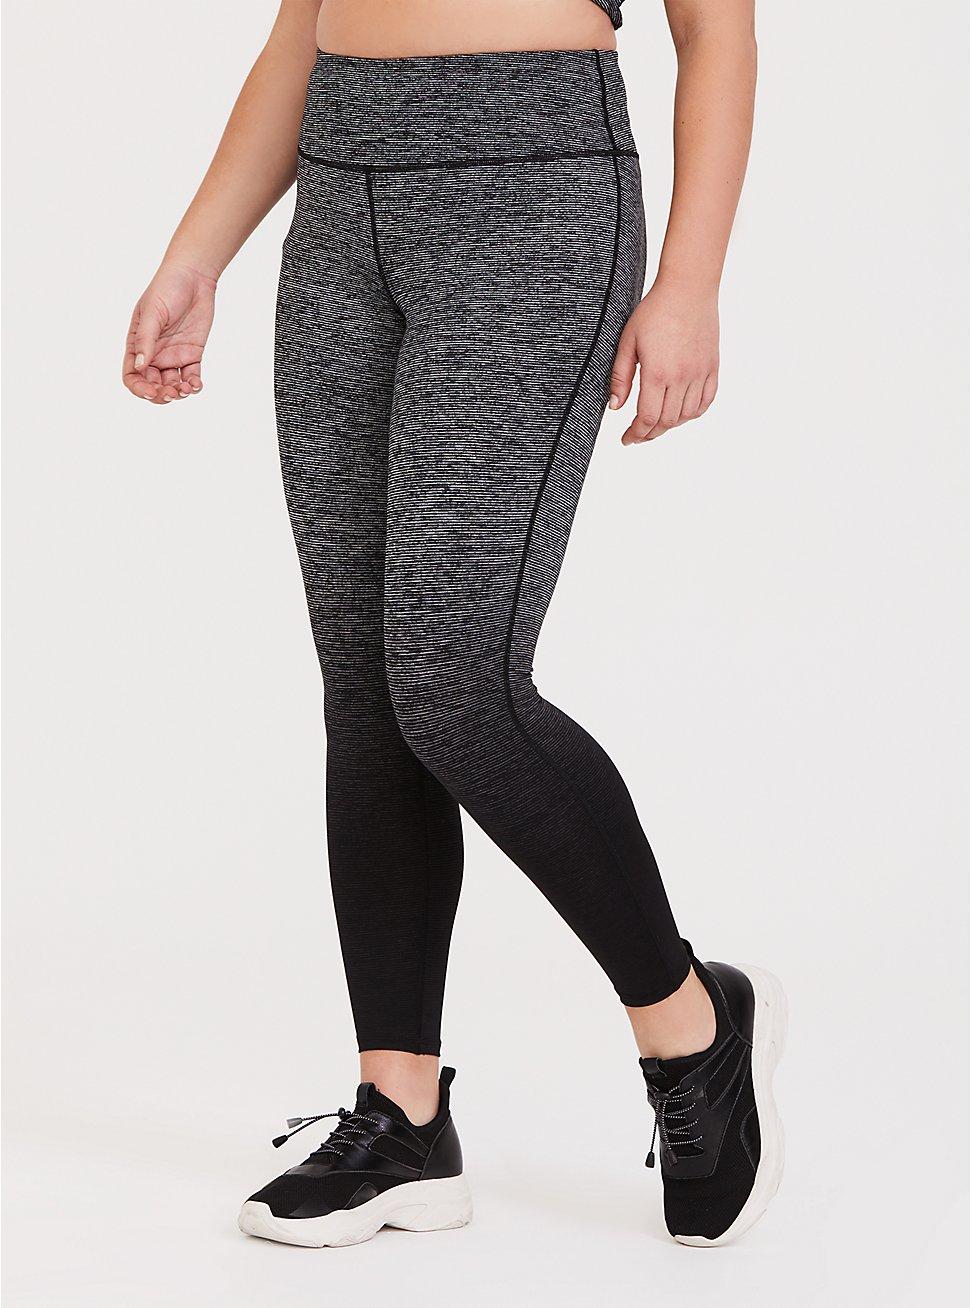 Dark Grey & Black Ombre Space-Dye Wicking Active Legging, MULTI, hi-res